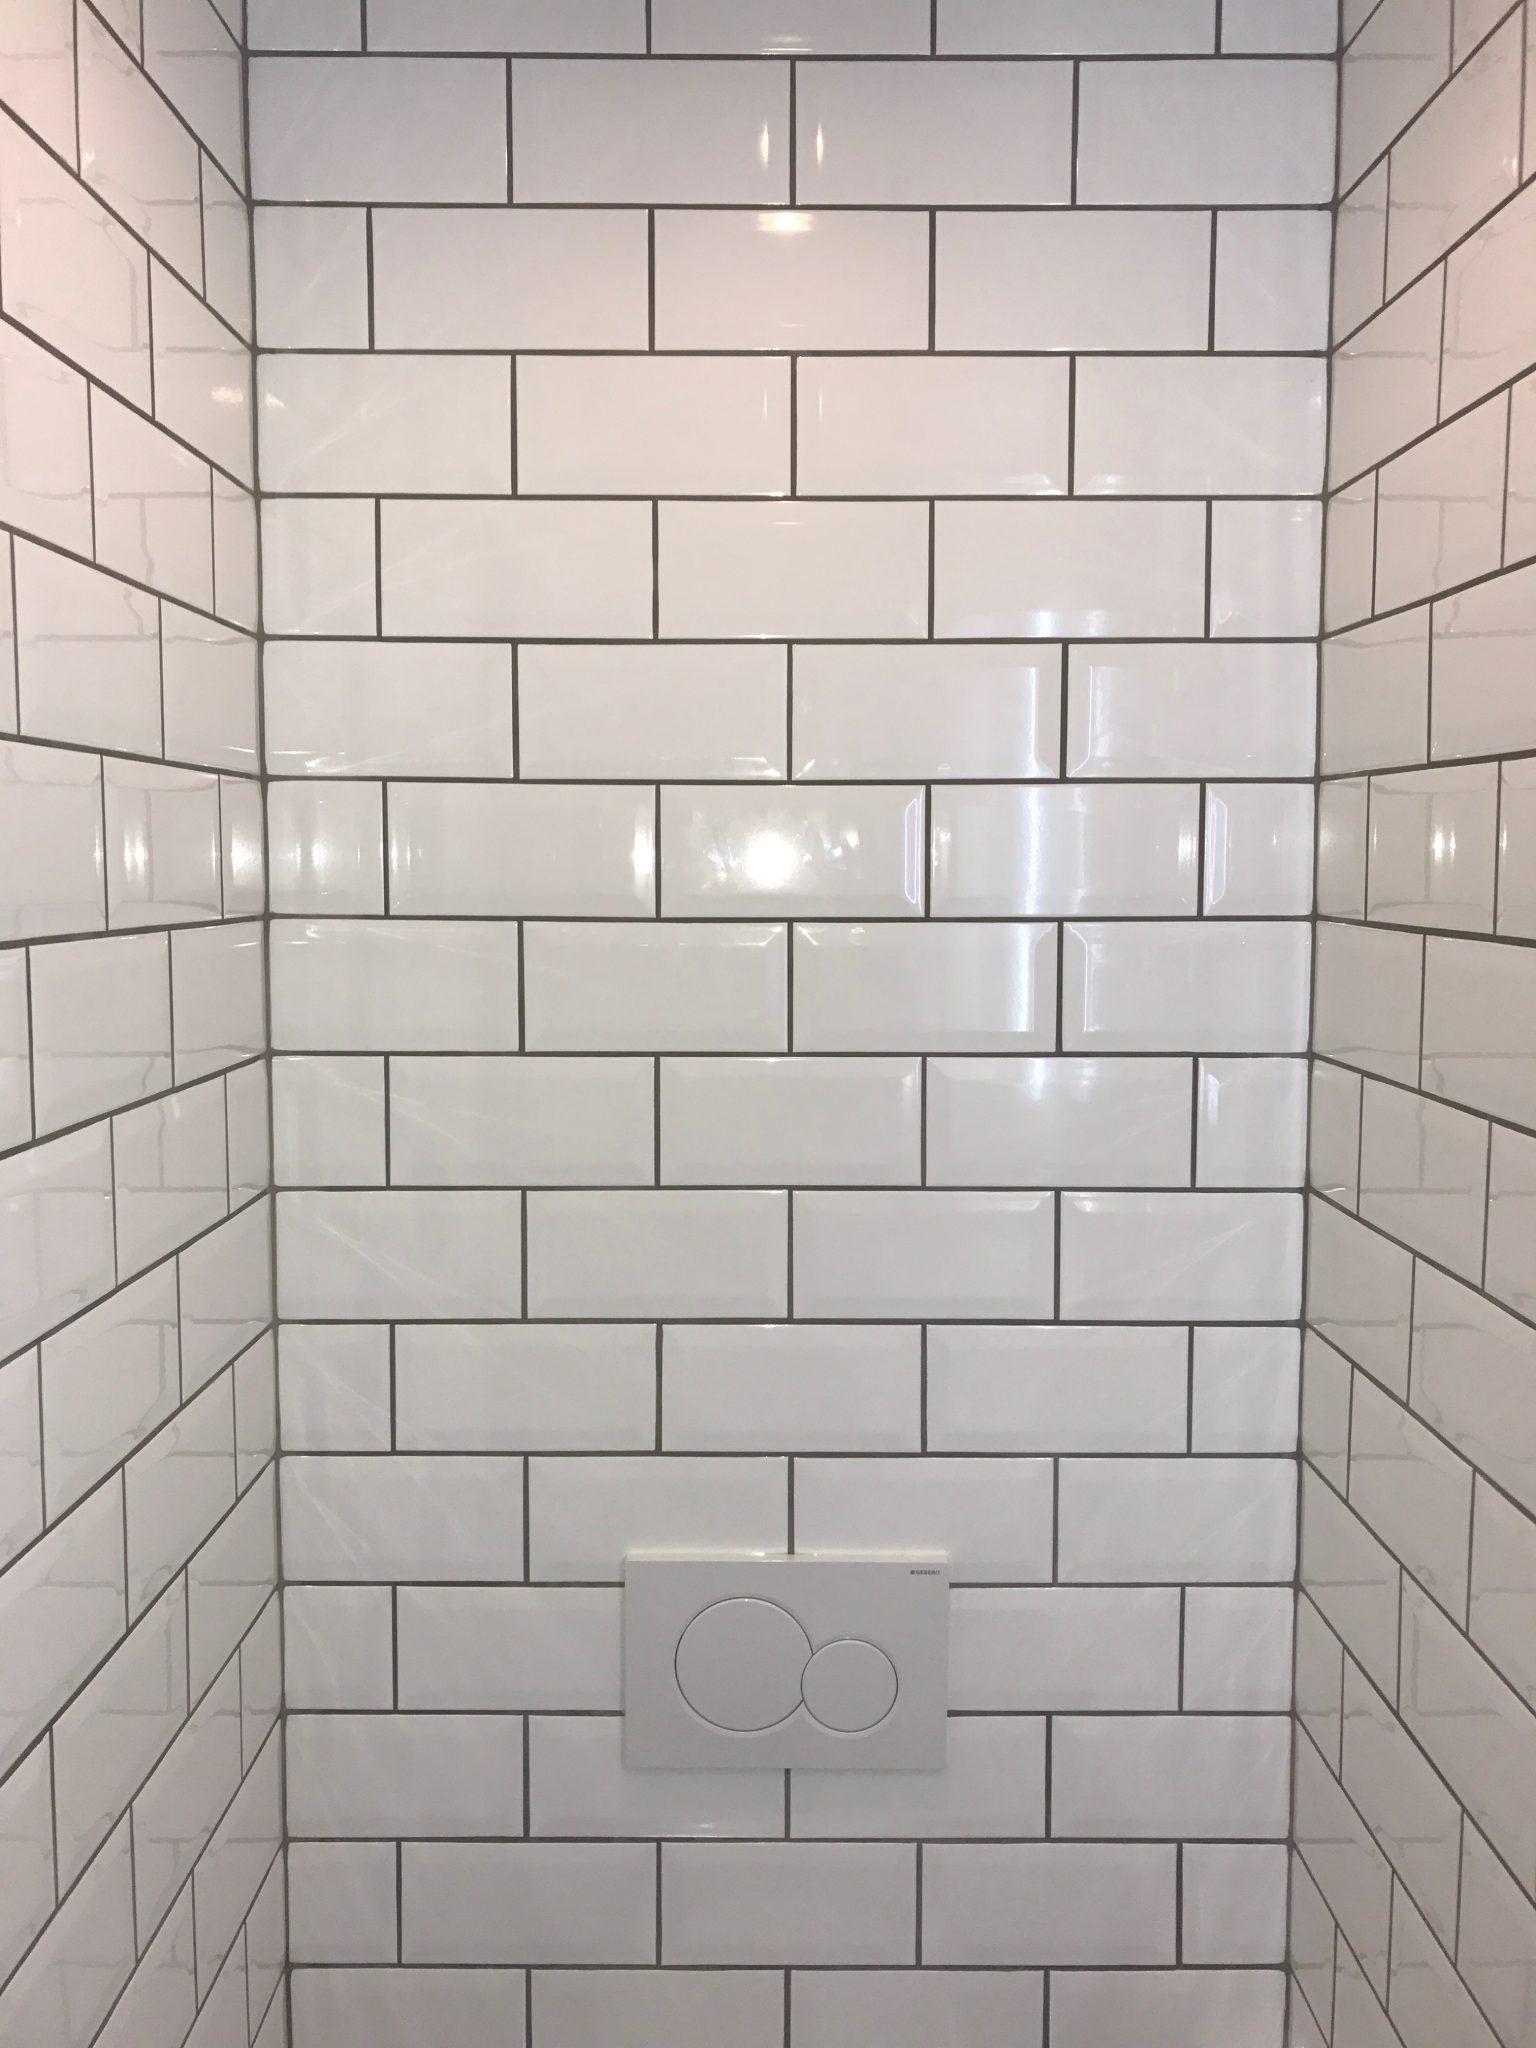 IMG 1236 - Tiling